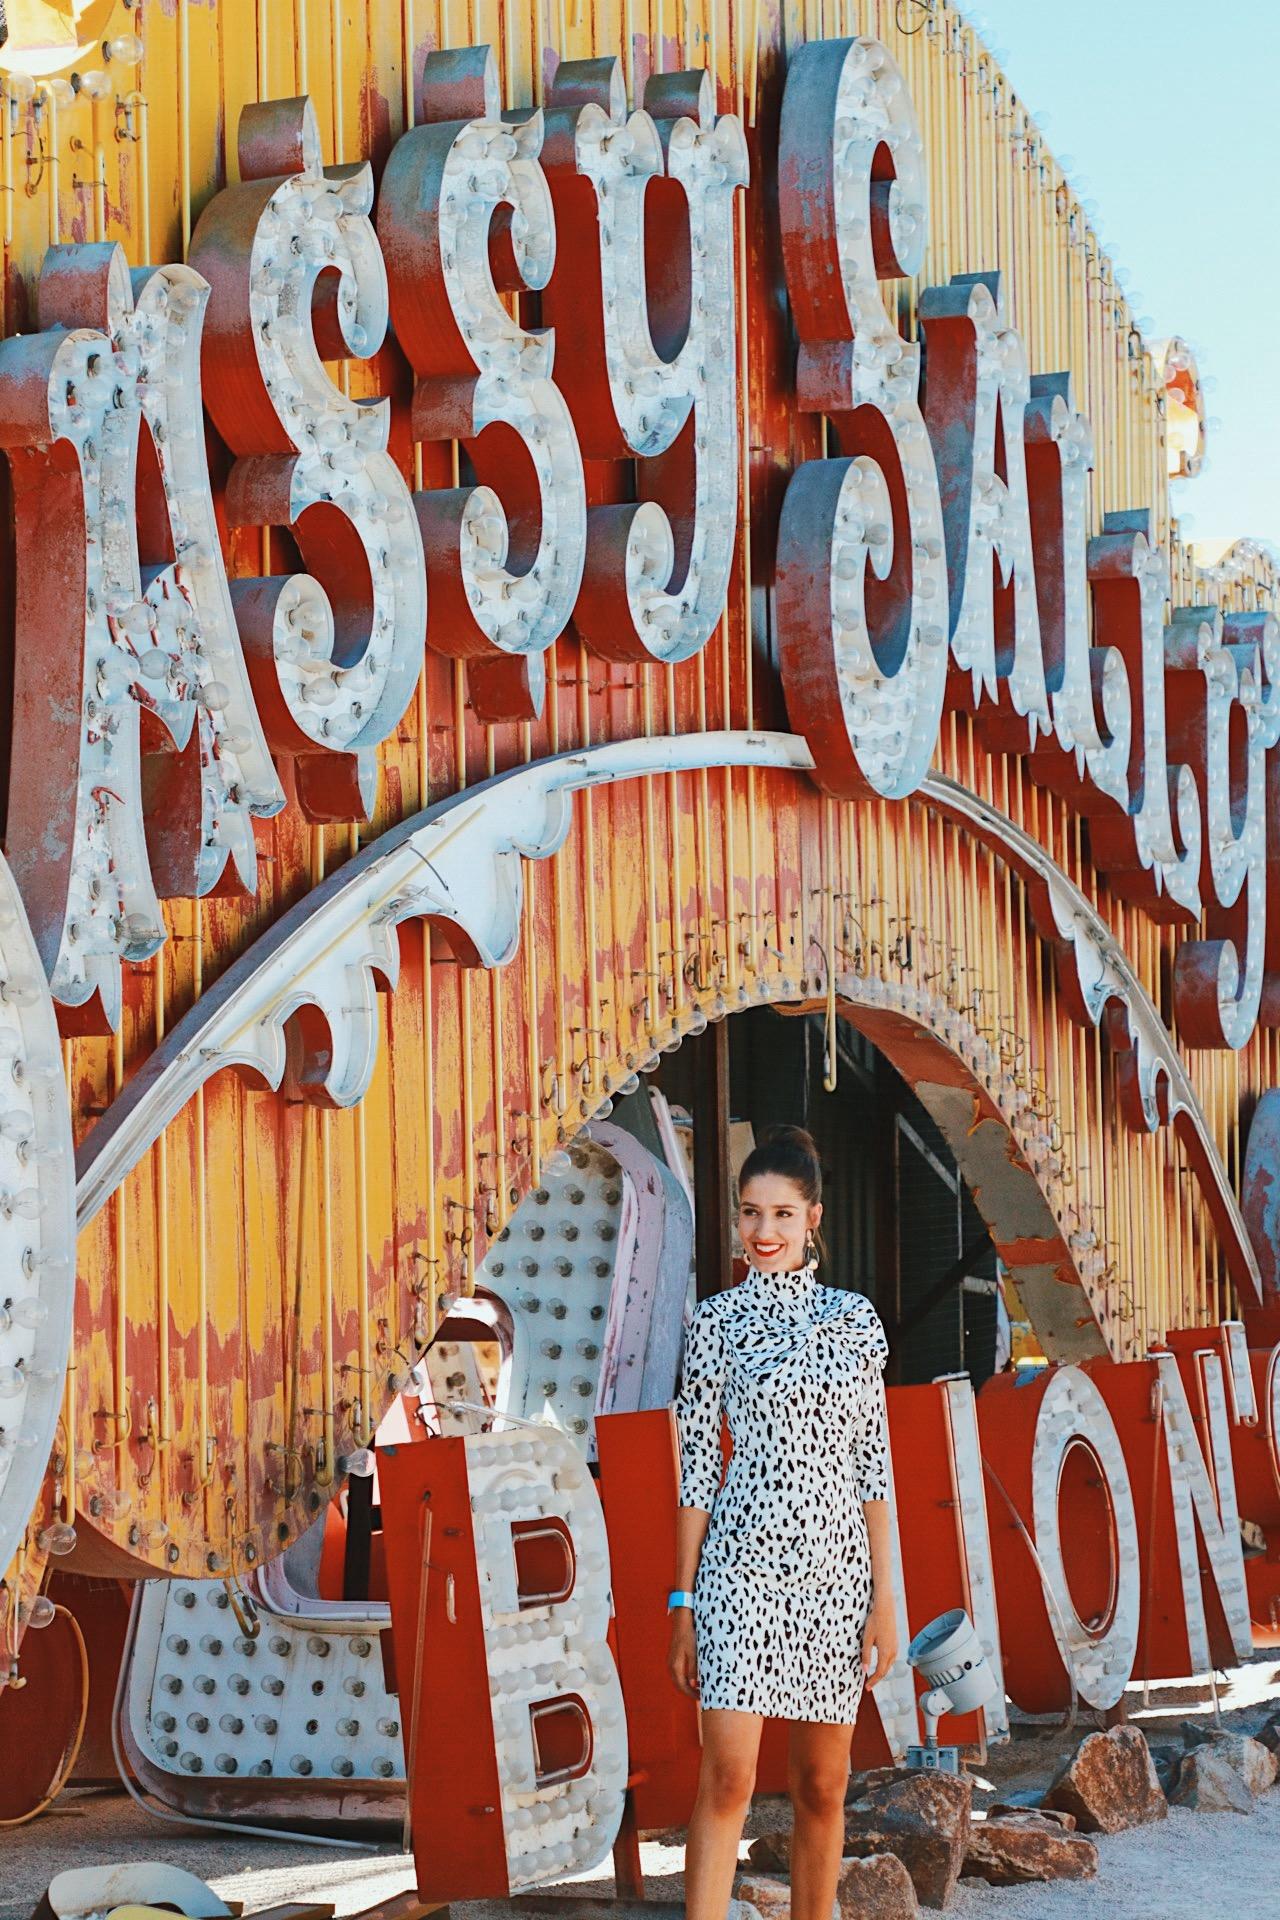 Las Vegas costa oeste museo de neon ruta